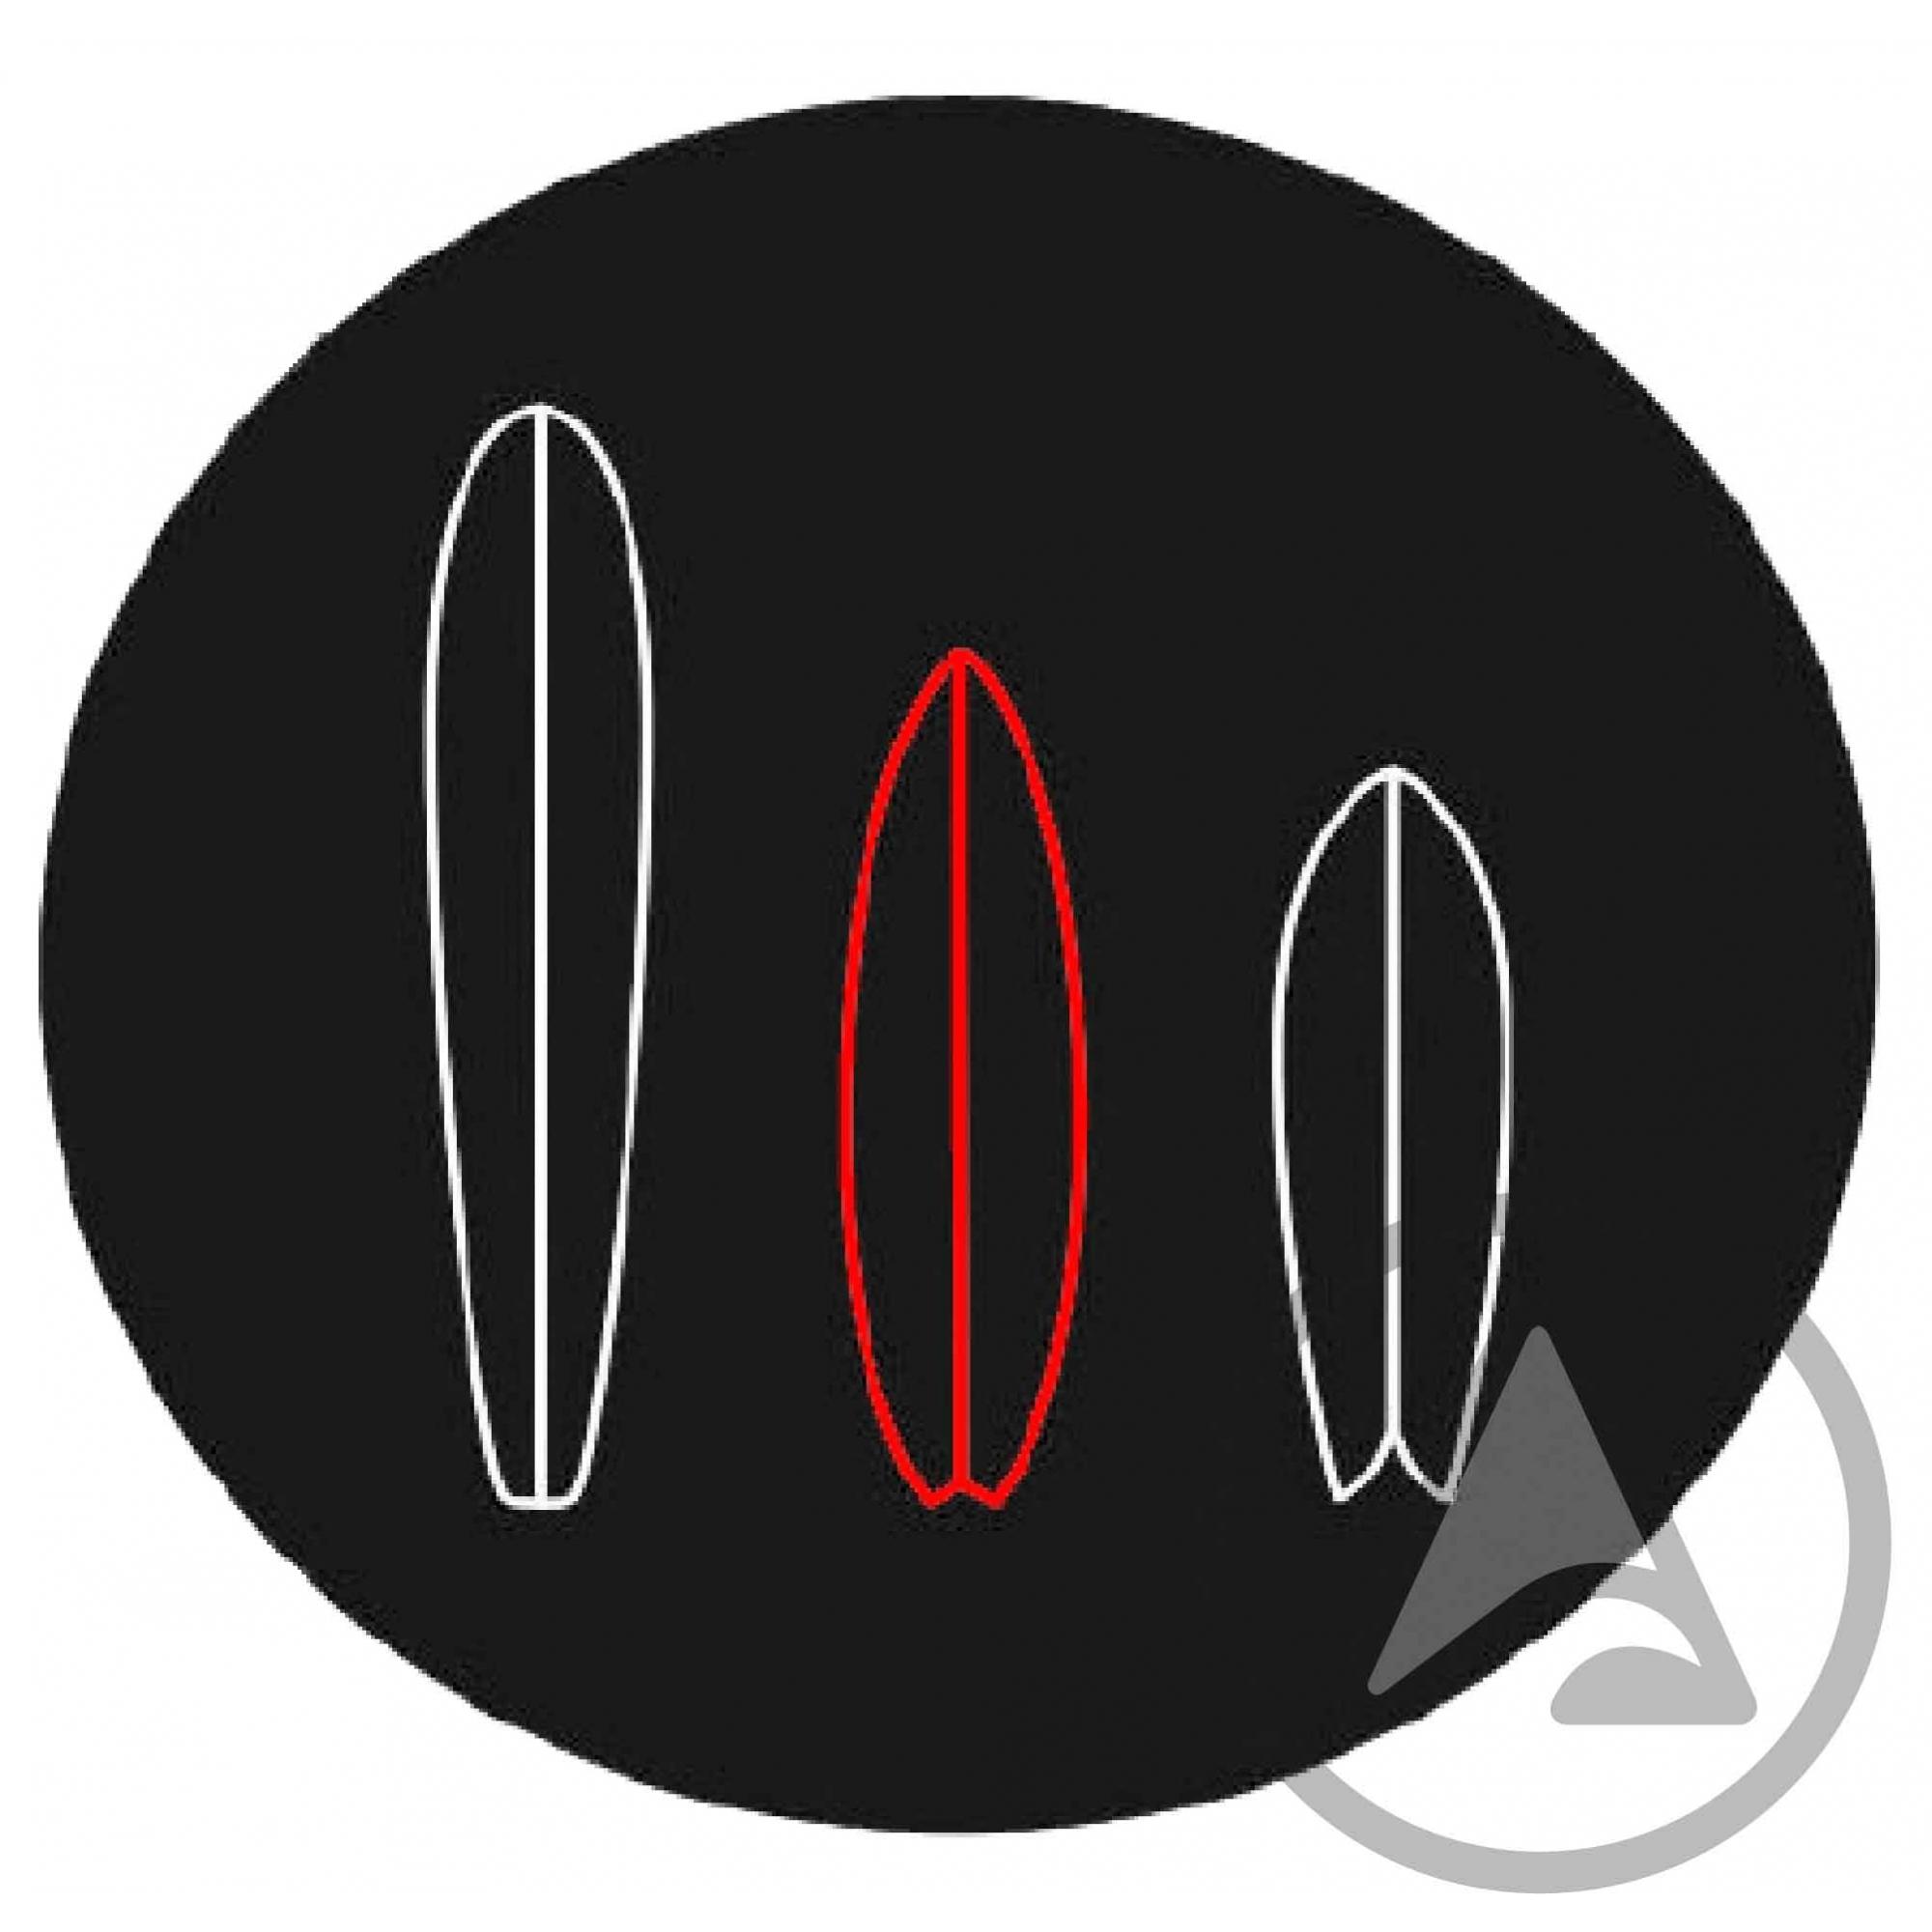 Capa Toalha Bullys Shortboard 6'0 até 6'3